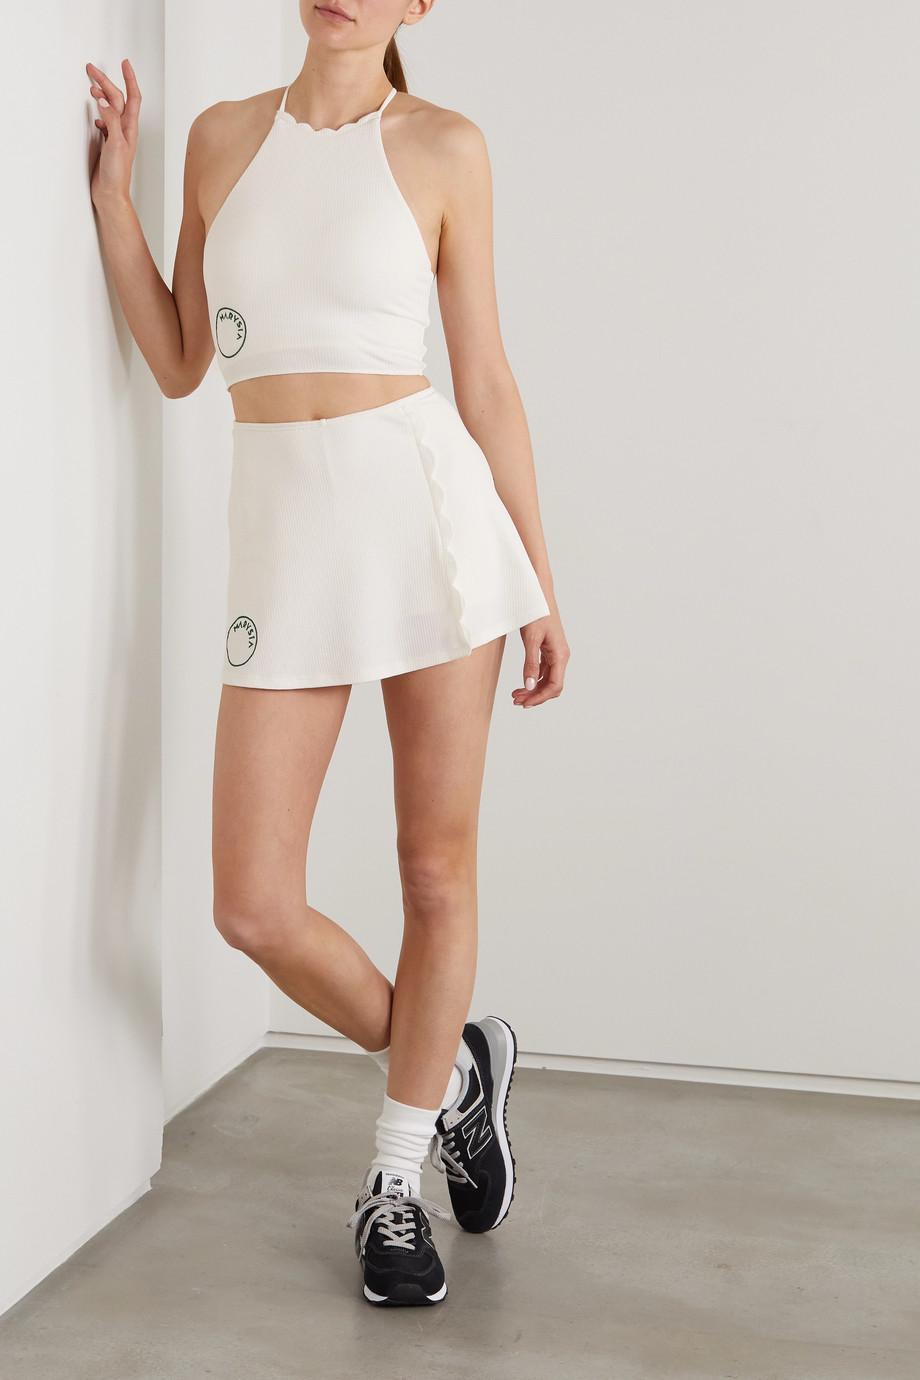 Marysia + NET SUSTAIN Steffi scalloped stretch recycled-seersucker sports bra